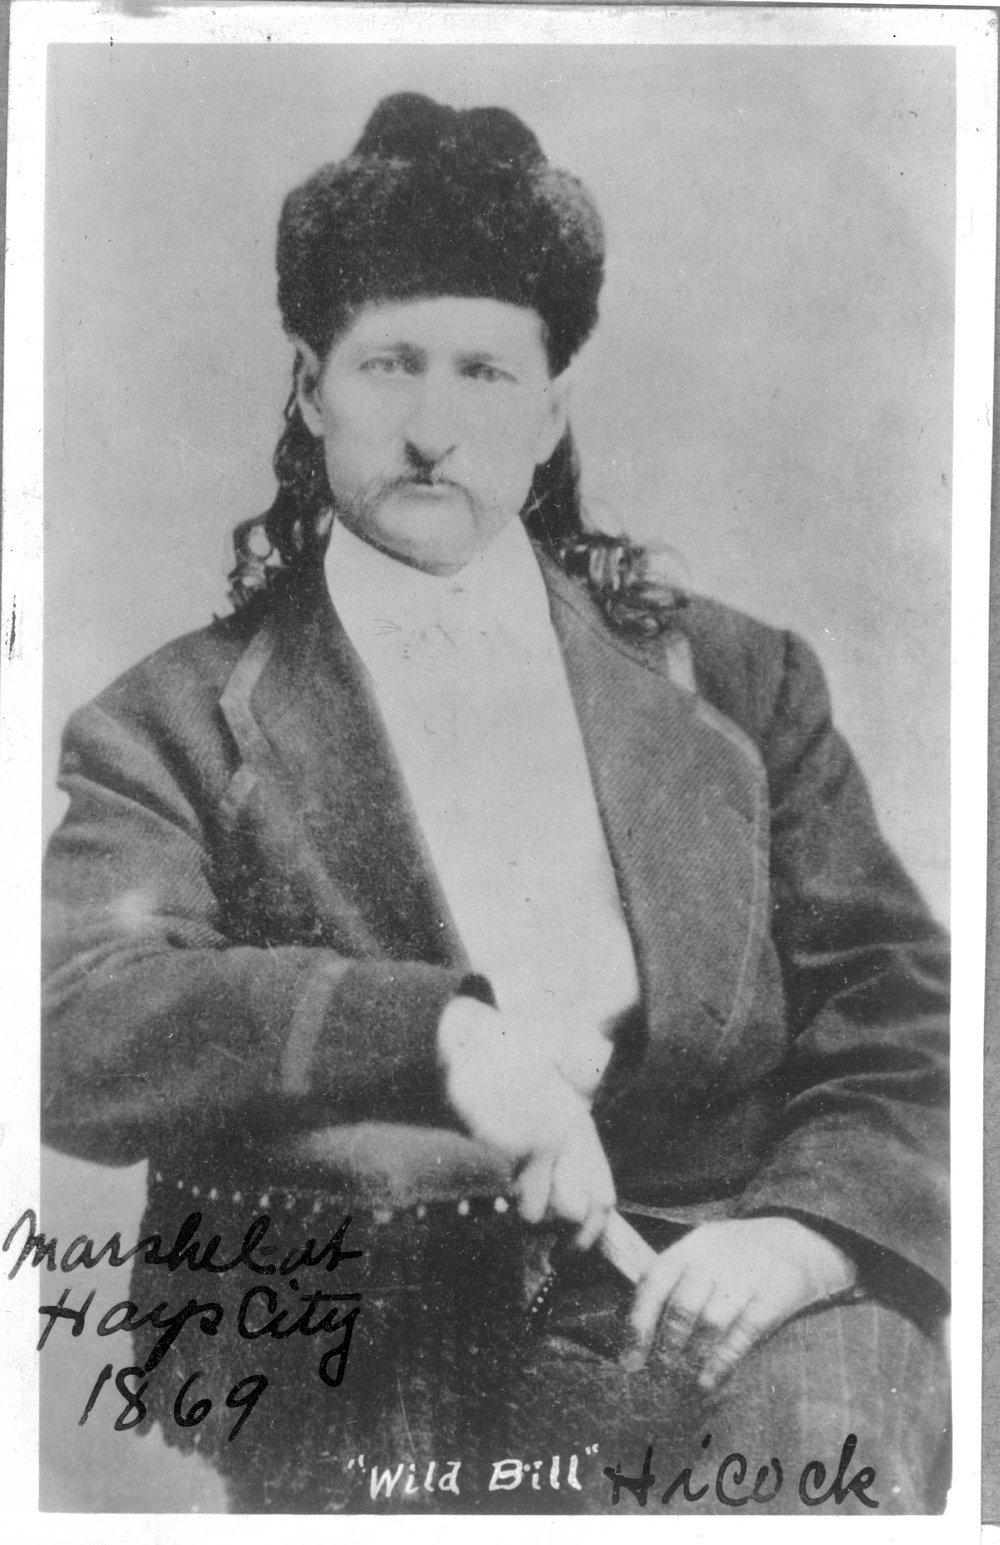 James Butler [Wild Bill] Hickok